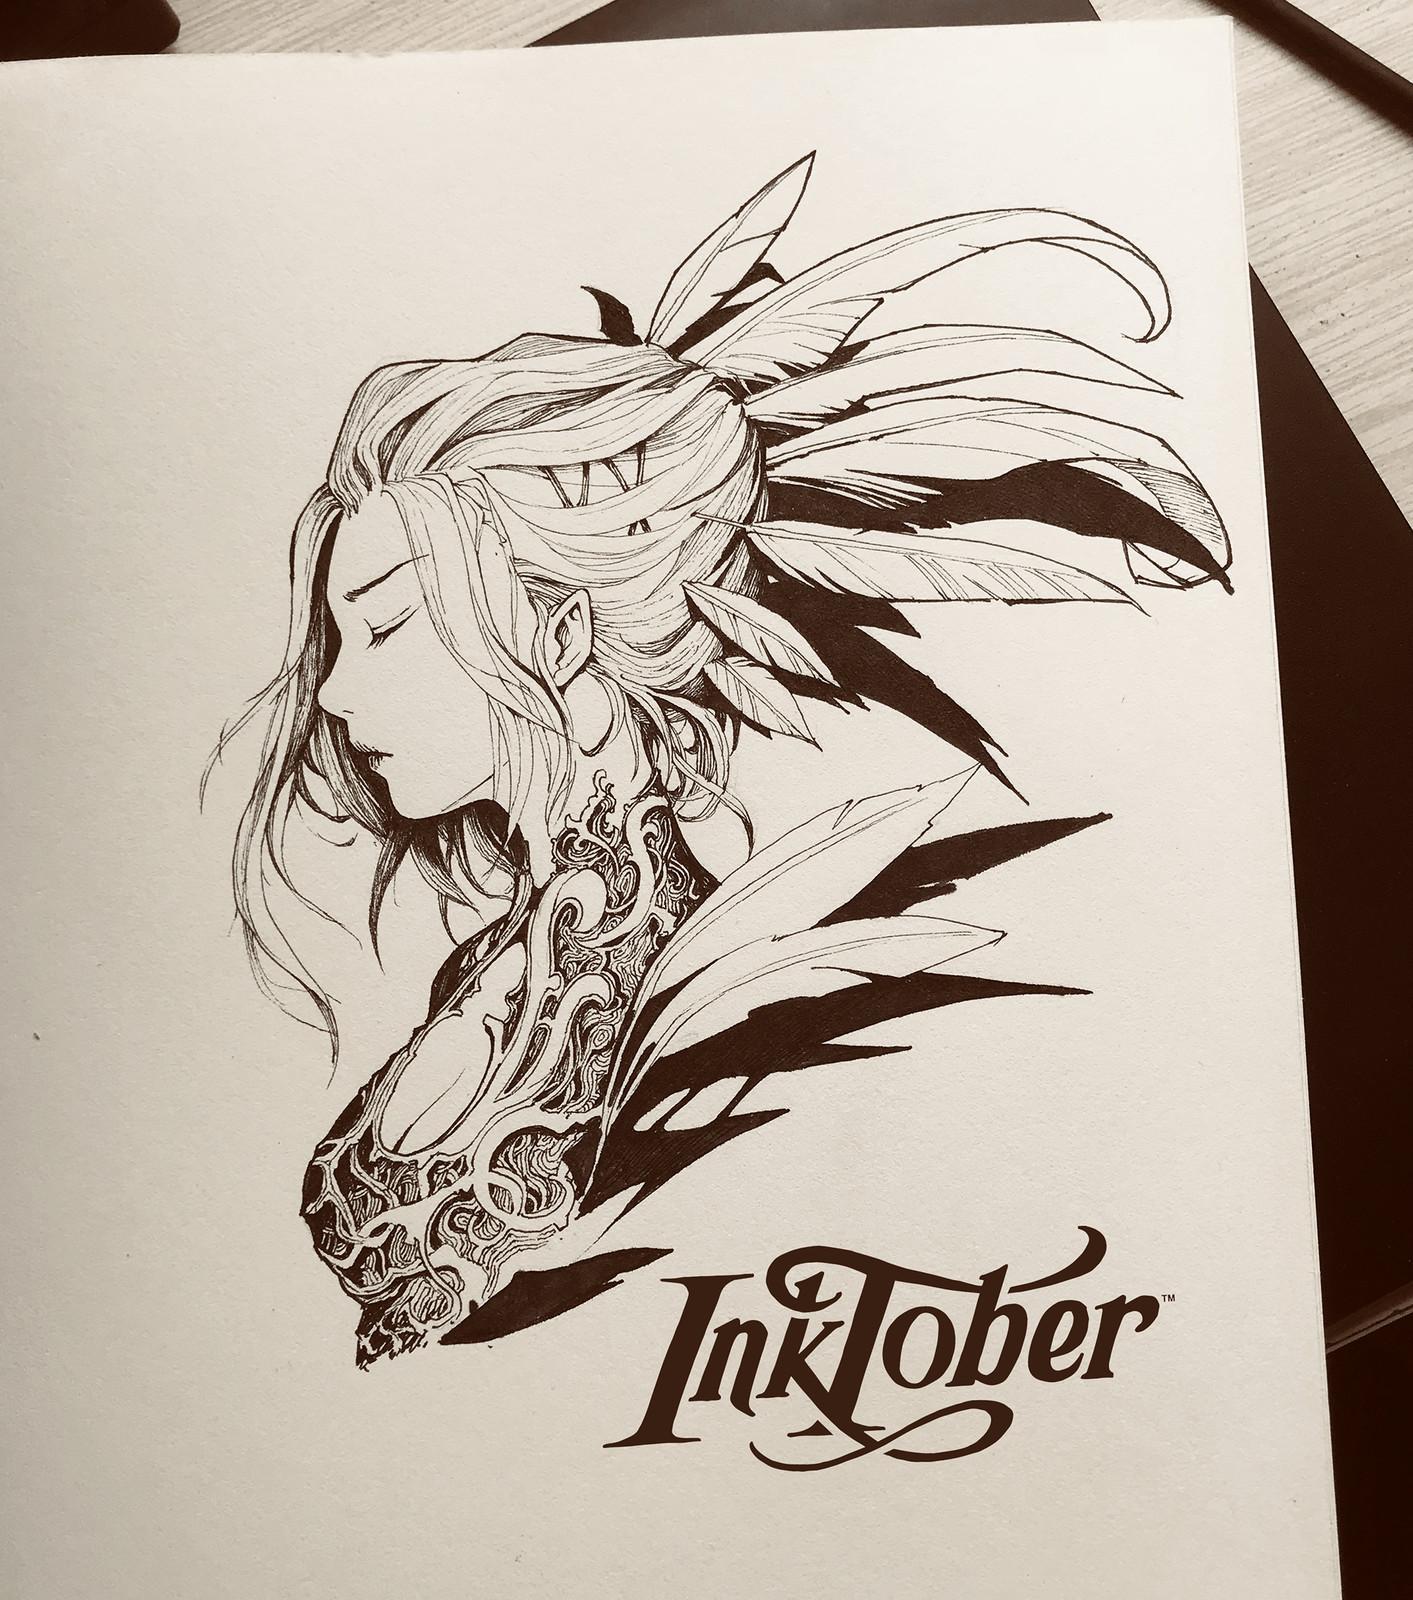 Inktober 2018 (part1)